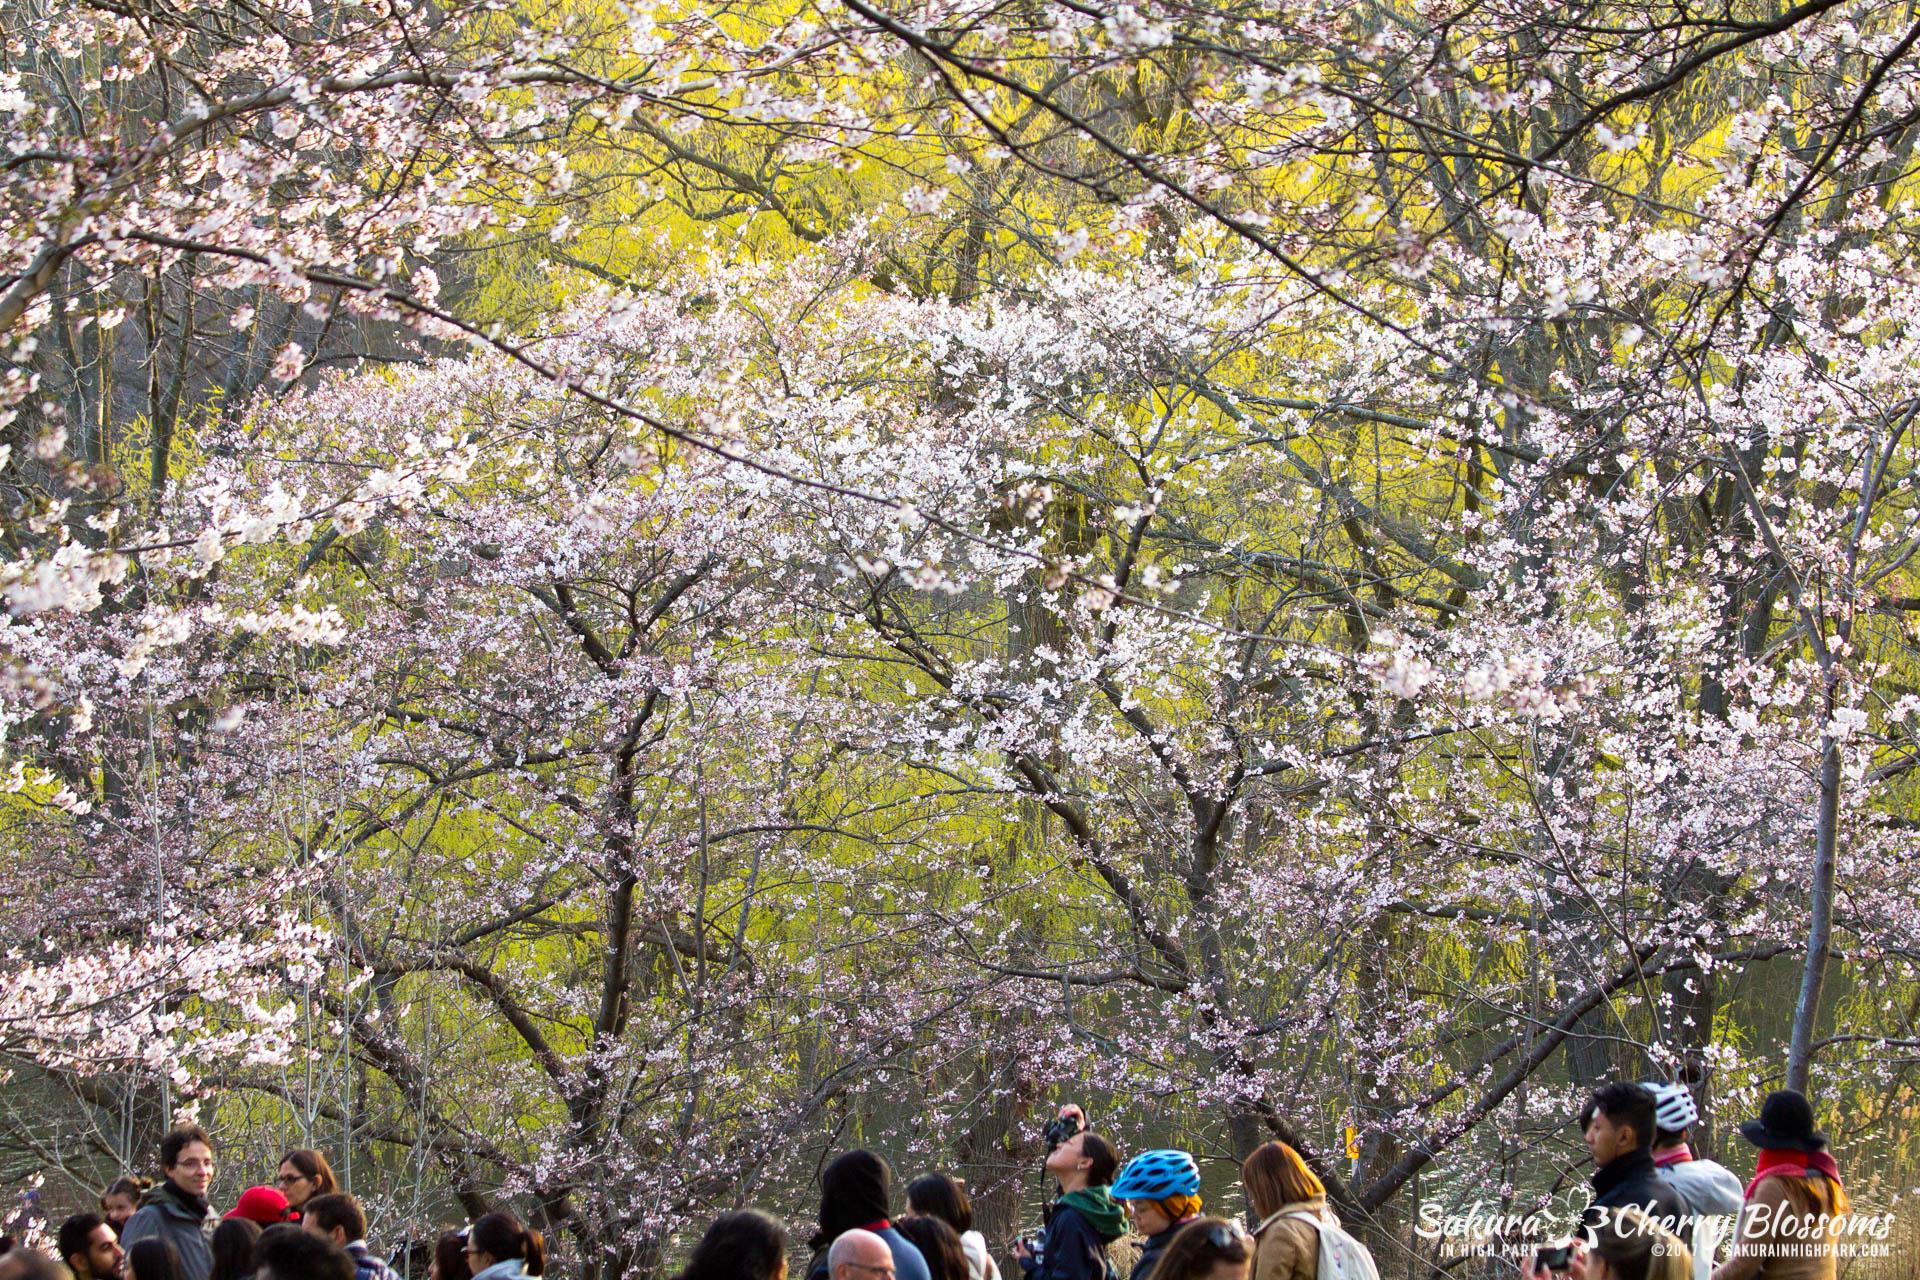 Sakura-Watch-April-24-2017-bloom-has-begun-with-more-to-come-97.jpg